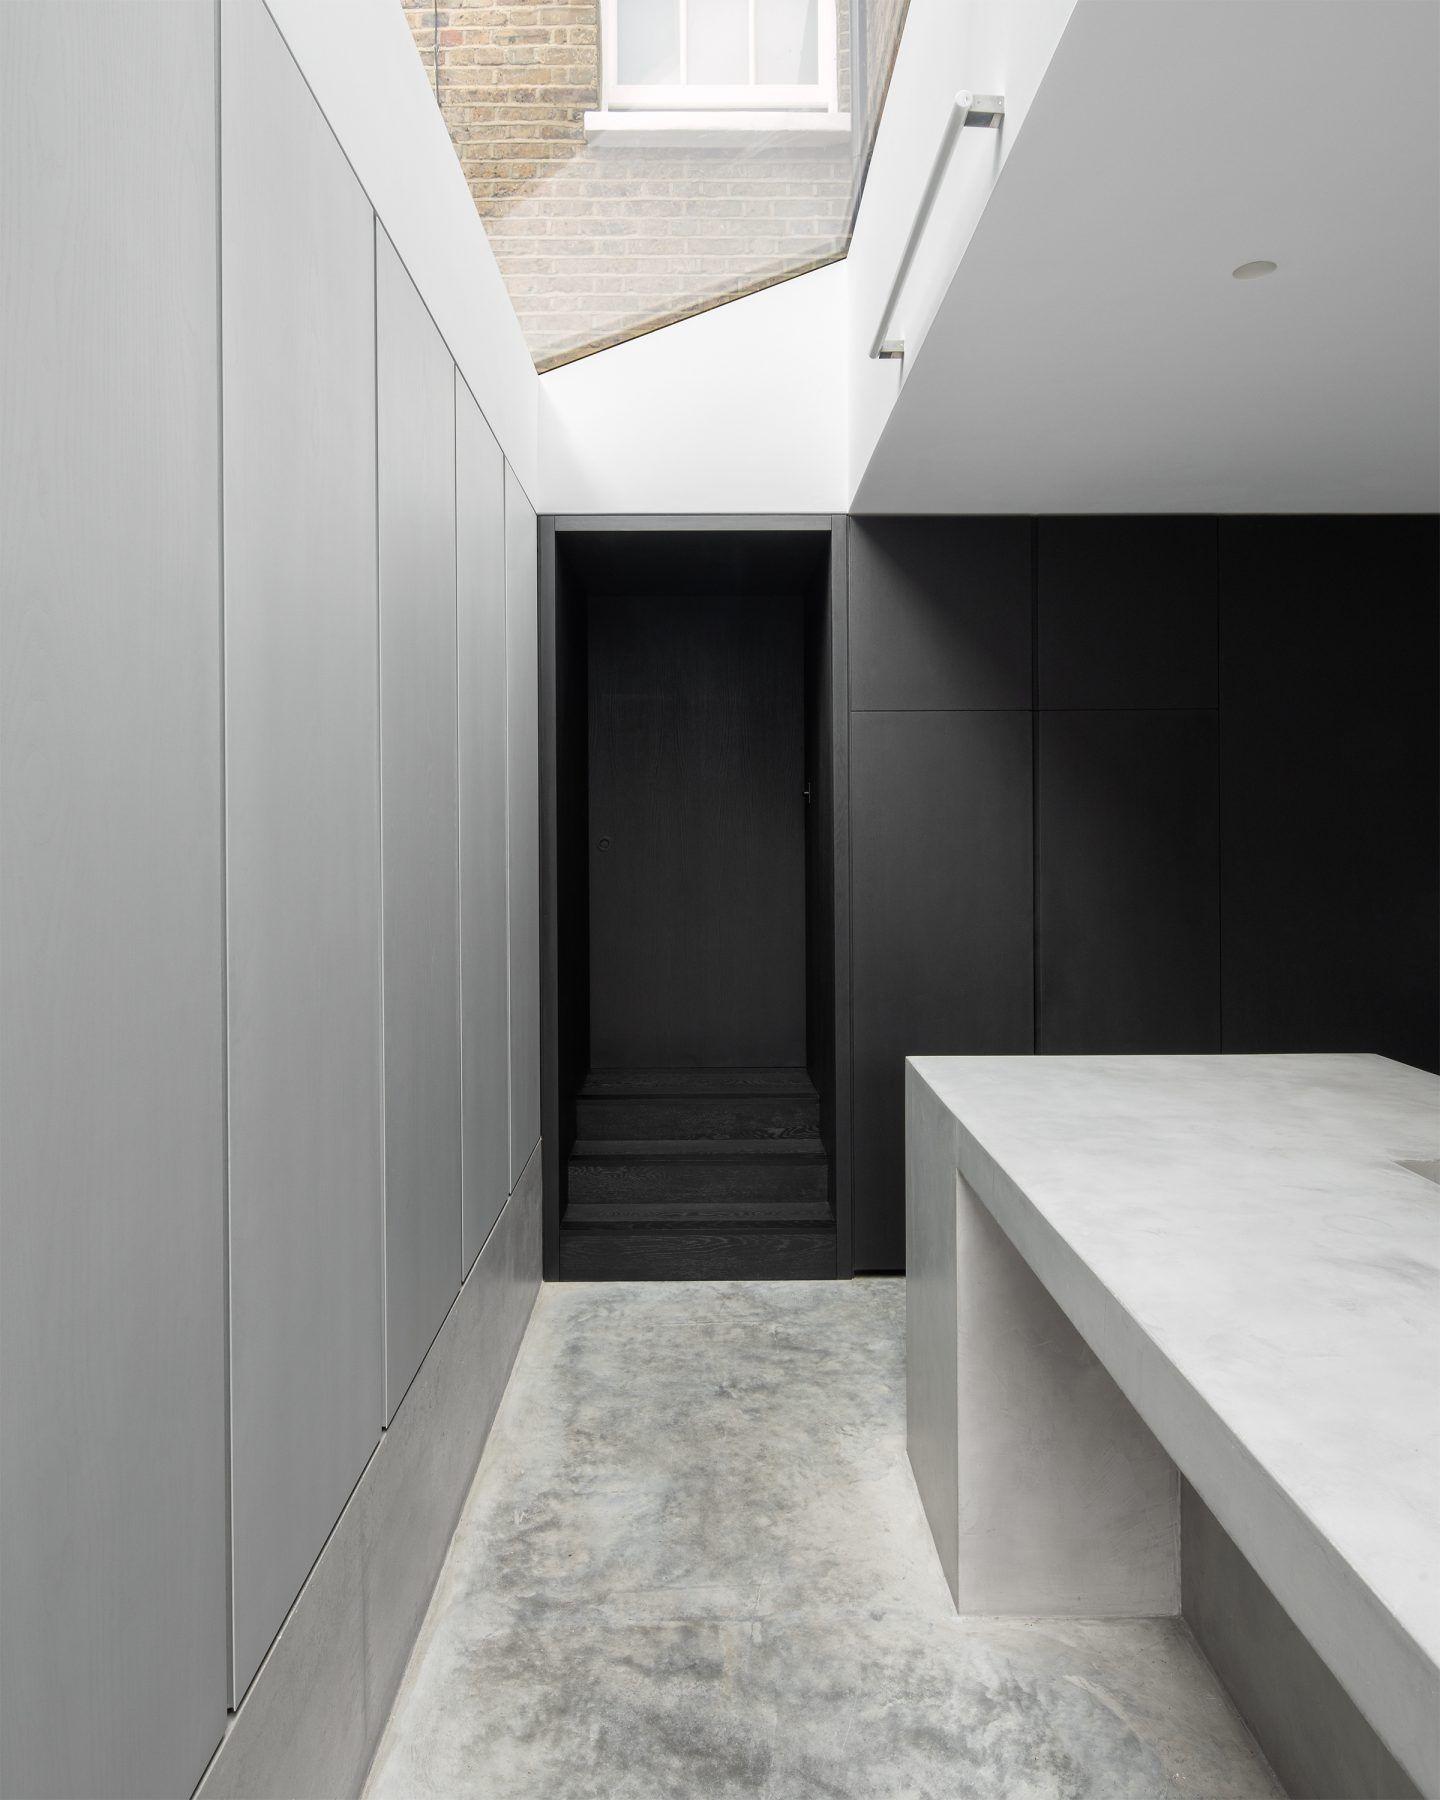 IGNANT-Architecture-Al-Jawad-Pike-Elsley-Road-6